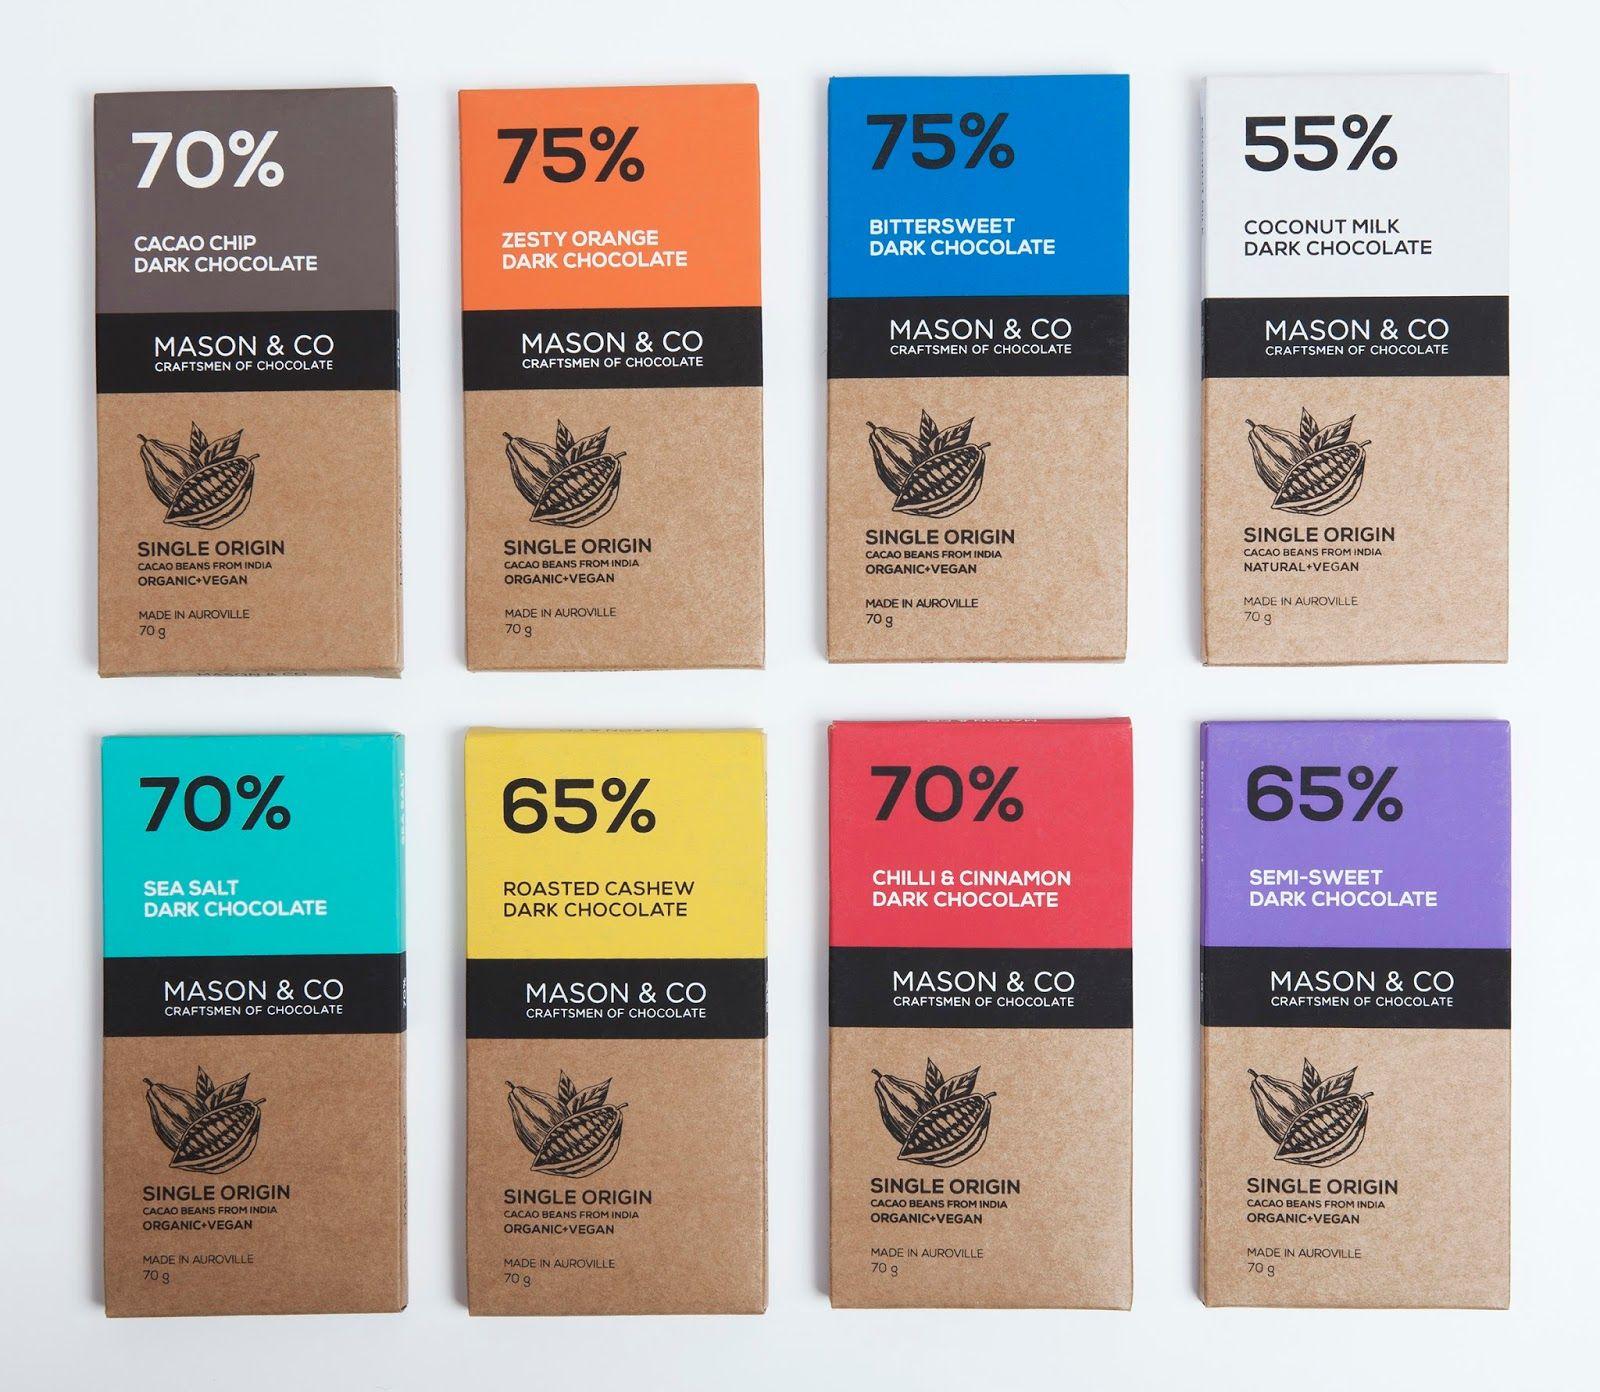 Mason Co Chocolate Bars The Dark Chocolate Collection Chocolate Packaging Design Chocolate Bar Design Chocolate Packaging